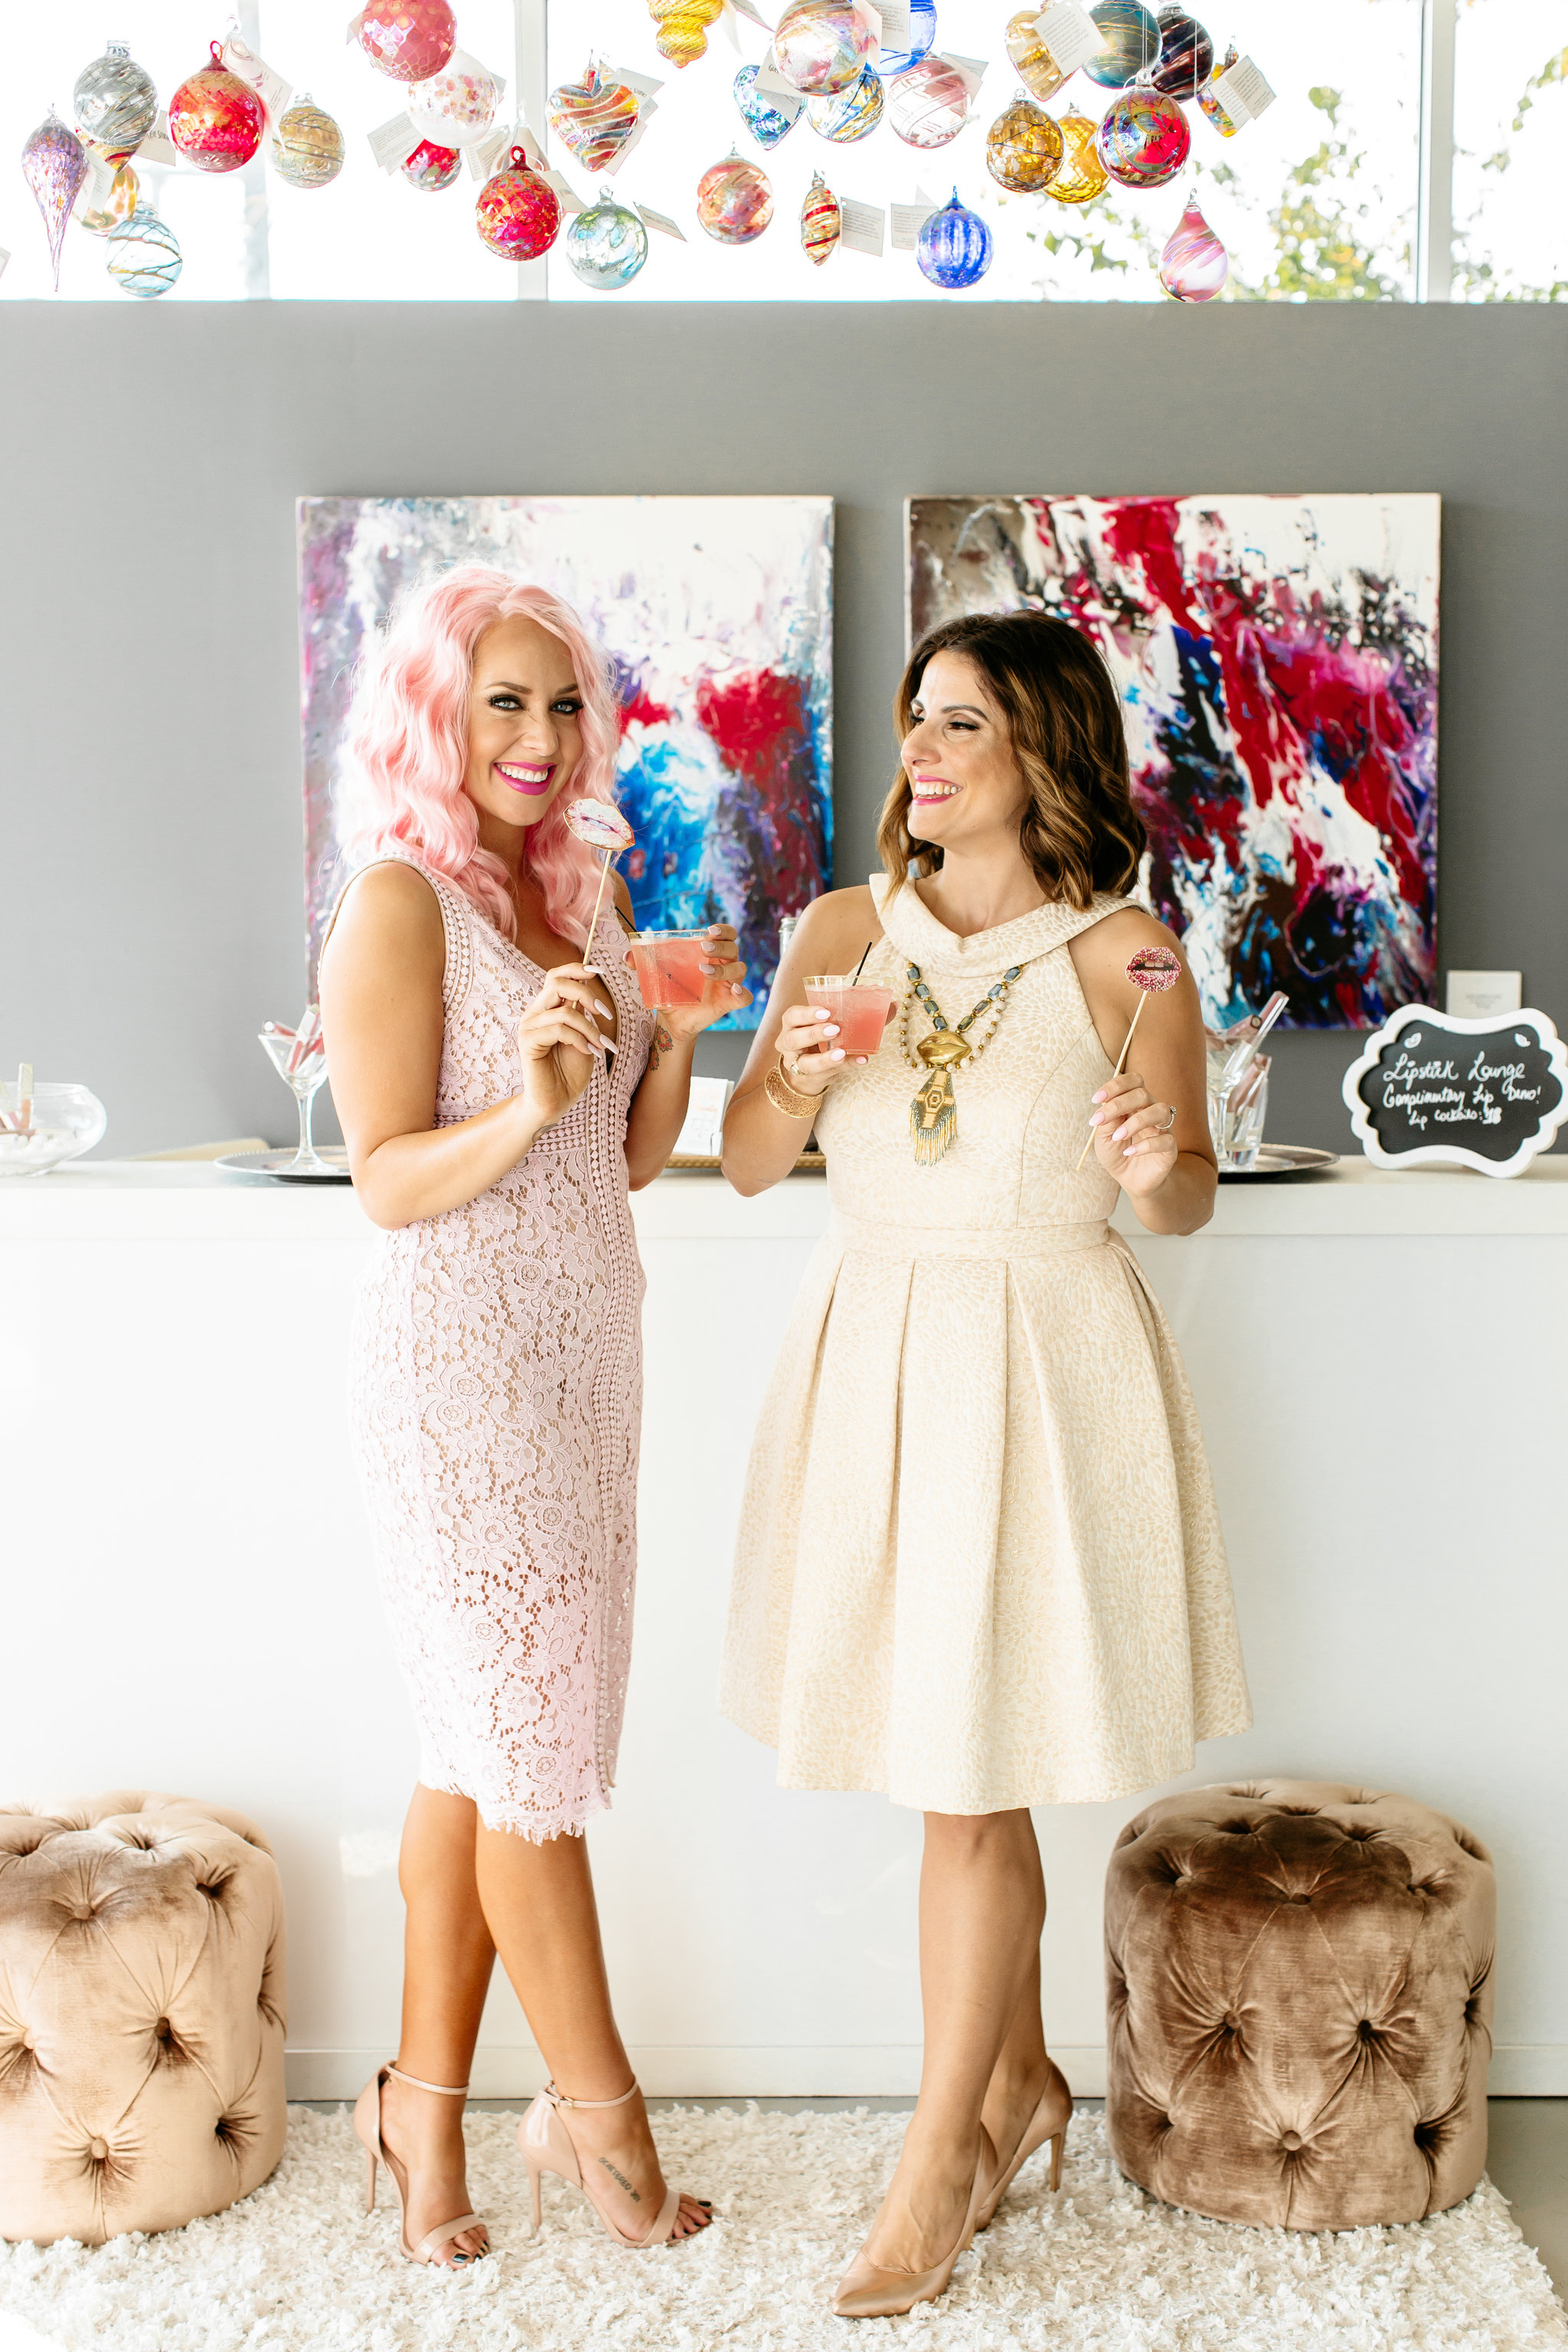 Alexa-Vossler-Photo_Dallas-Event-Photographer_Brite-Bar-Beauty-2018-Lipstick-Launch-Party-8.jpg